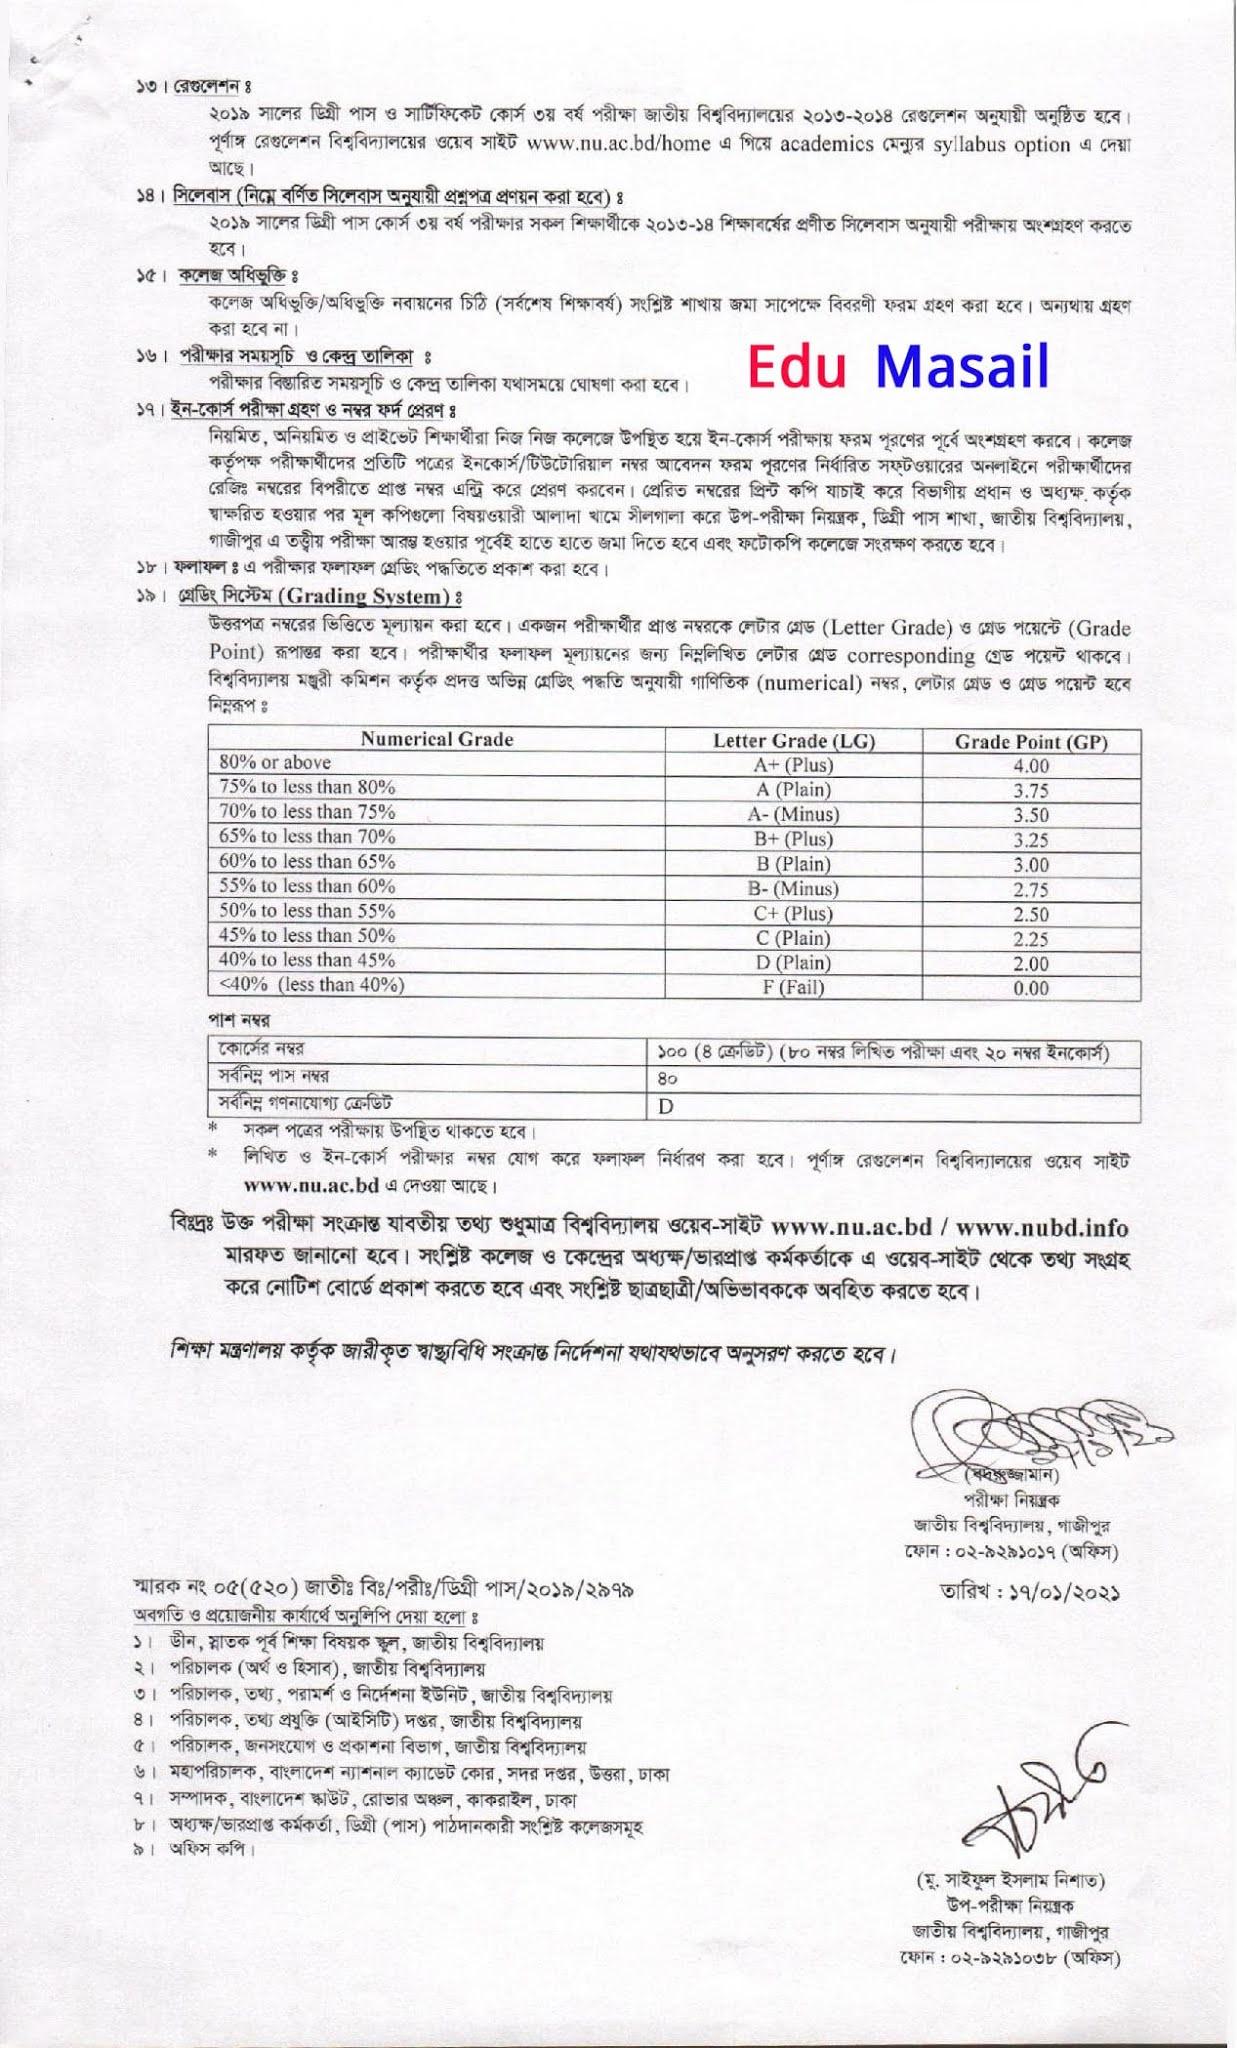 degree 3rd year form fillup 2021 - part 3 - edu masail